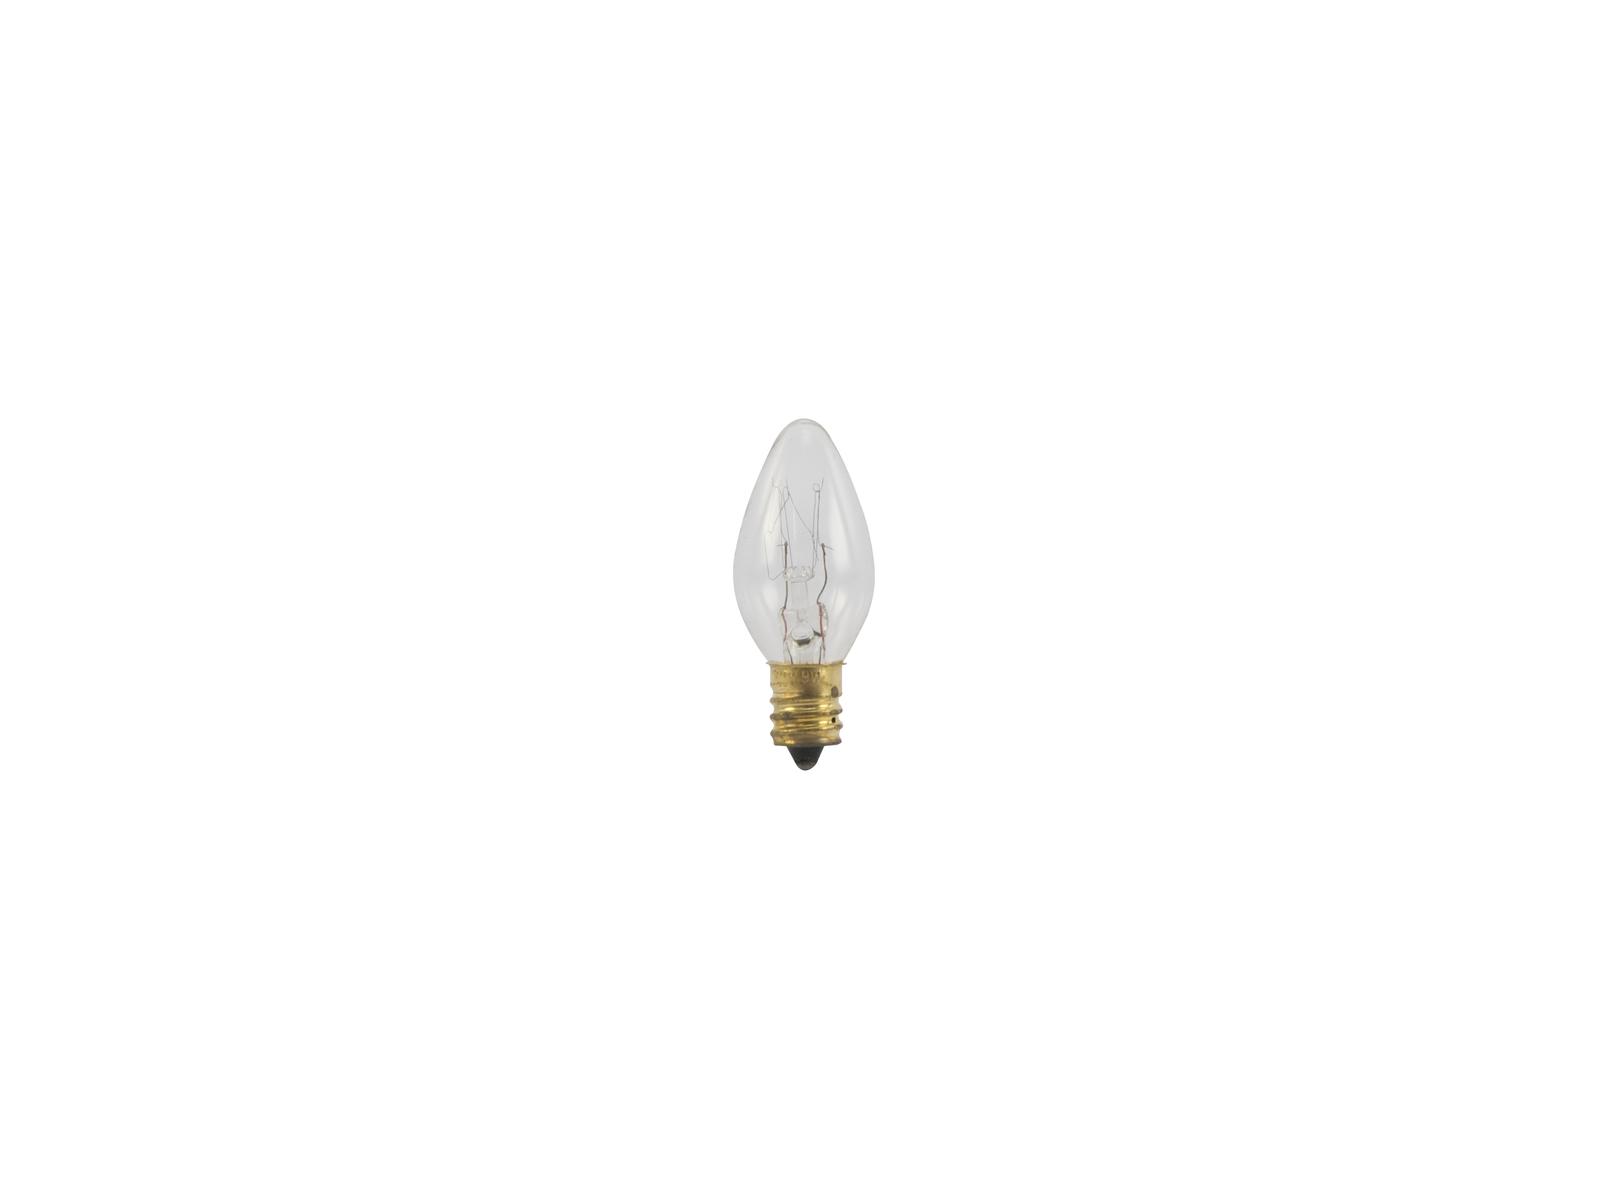 OMNILUX 230V/9W E-12 Kerzenlampe klein